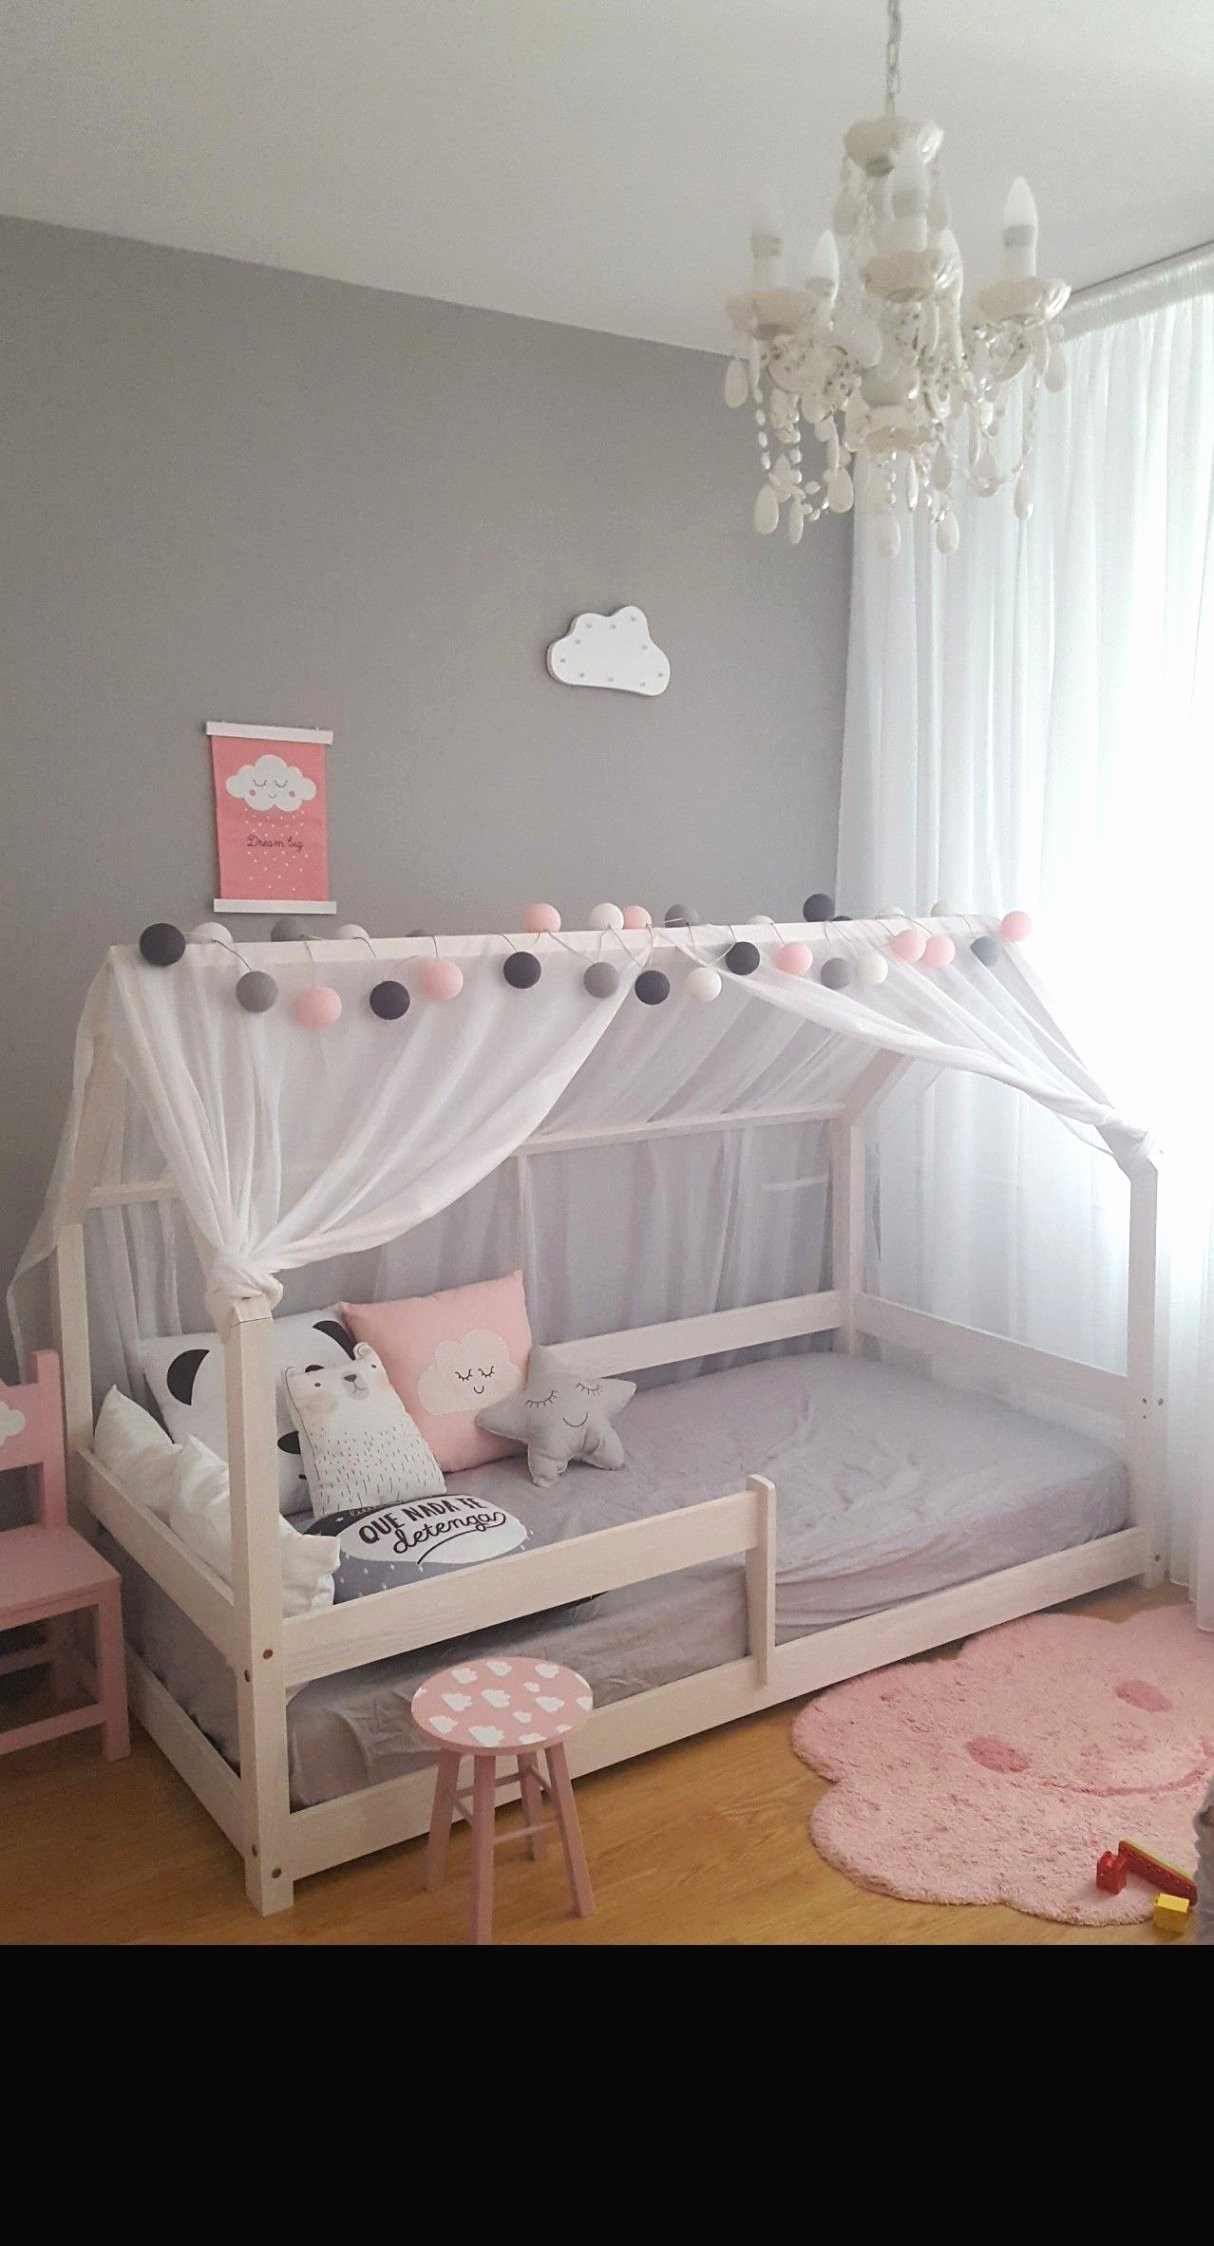 Full Size of Kinderzimmer Jungen Ikea Elegant Schlafsofa Neu Klein Sofa Regale Regal Weiß Kinderzimmer Kinderzimmer Jungen